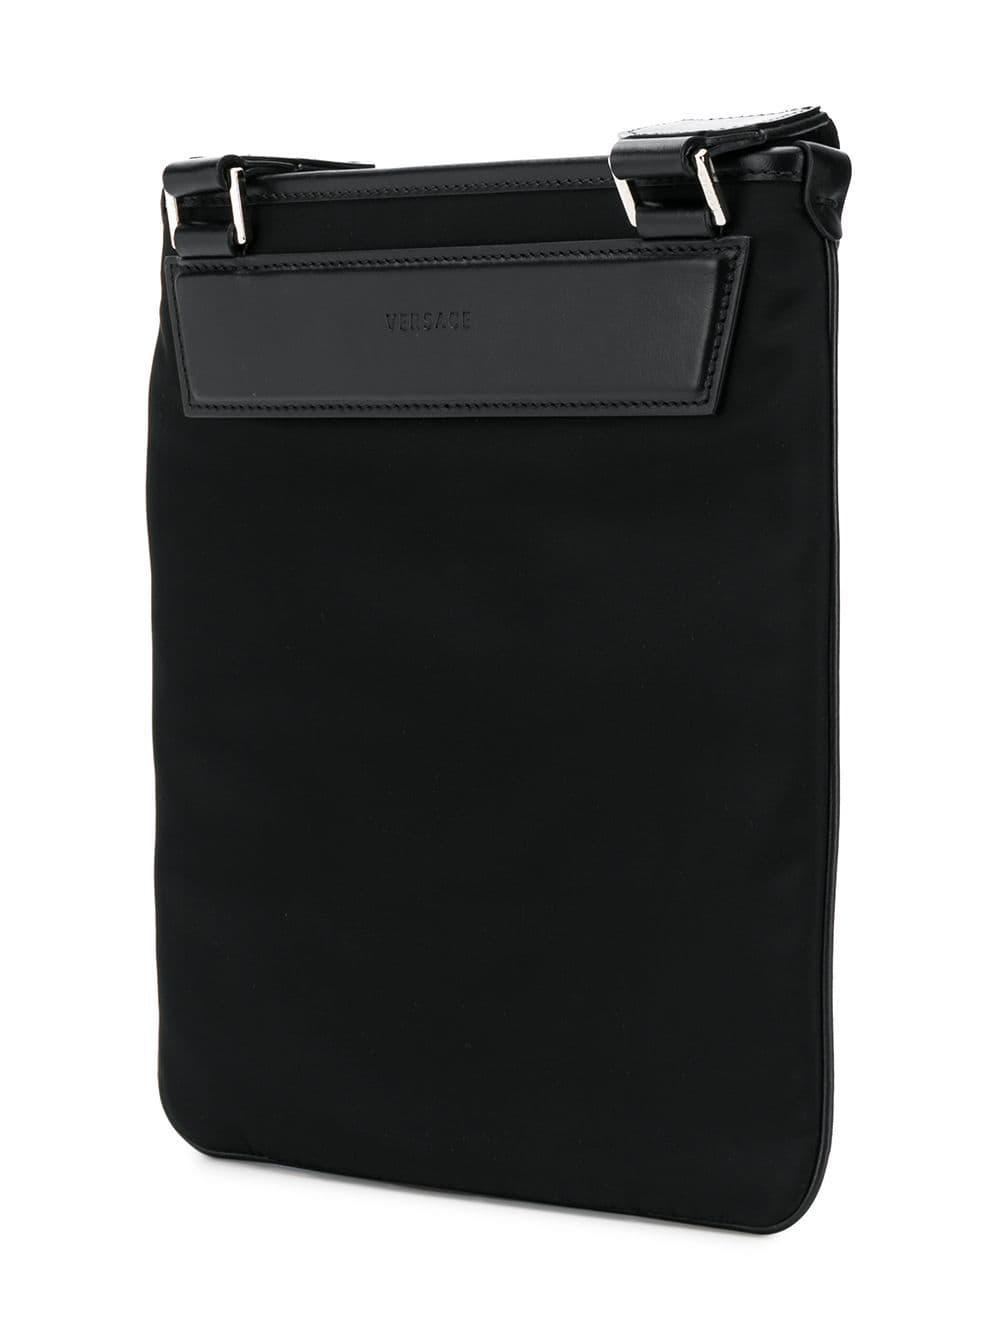 Versace Leather Medusa Zipped Messenger Bag In Black For